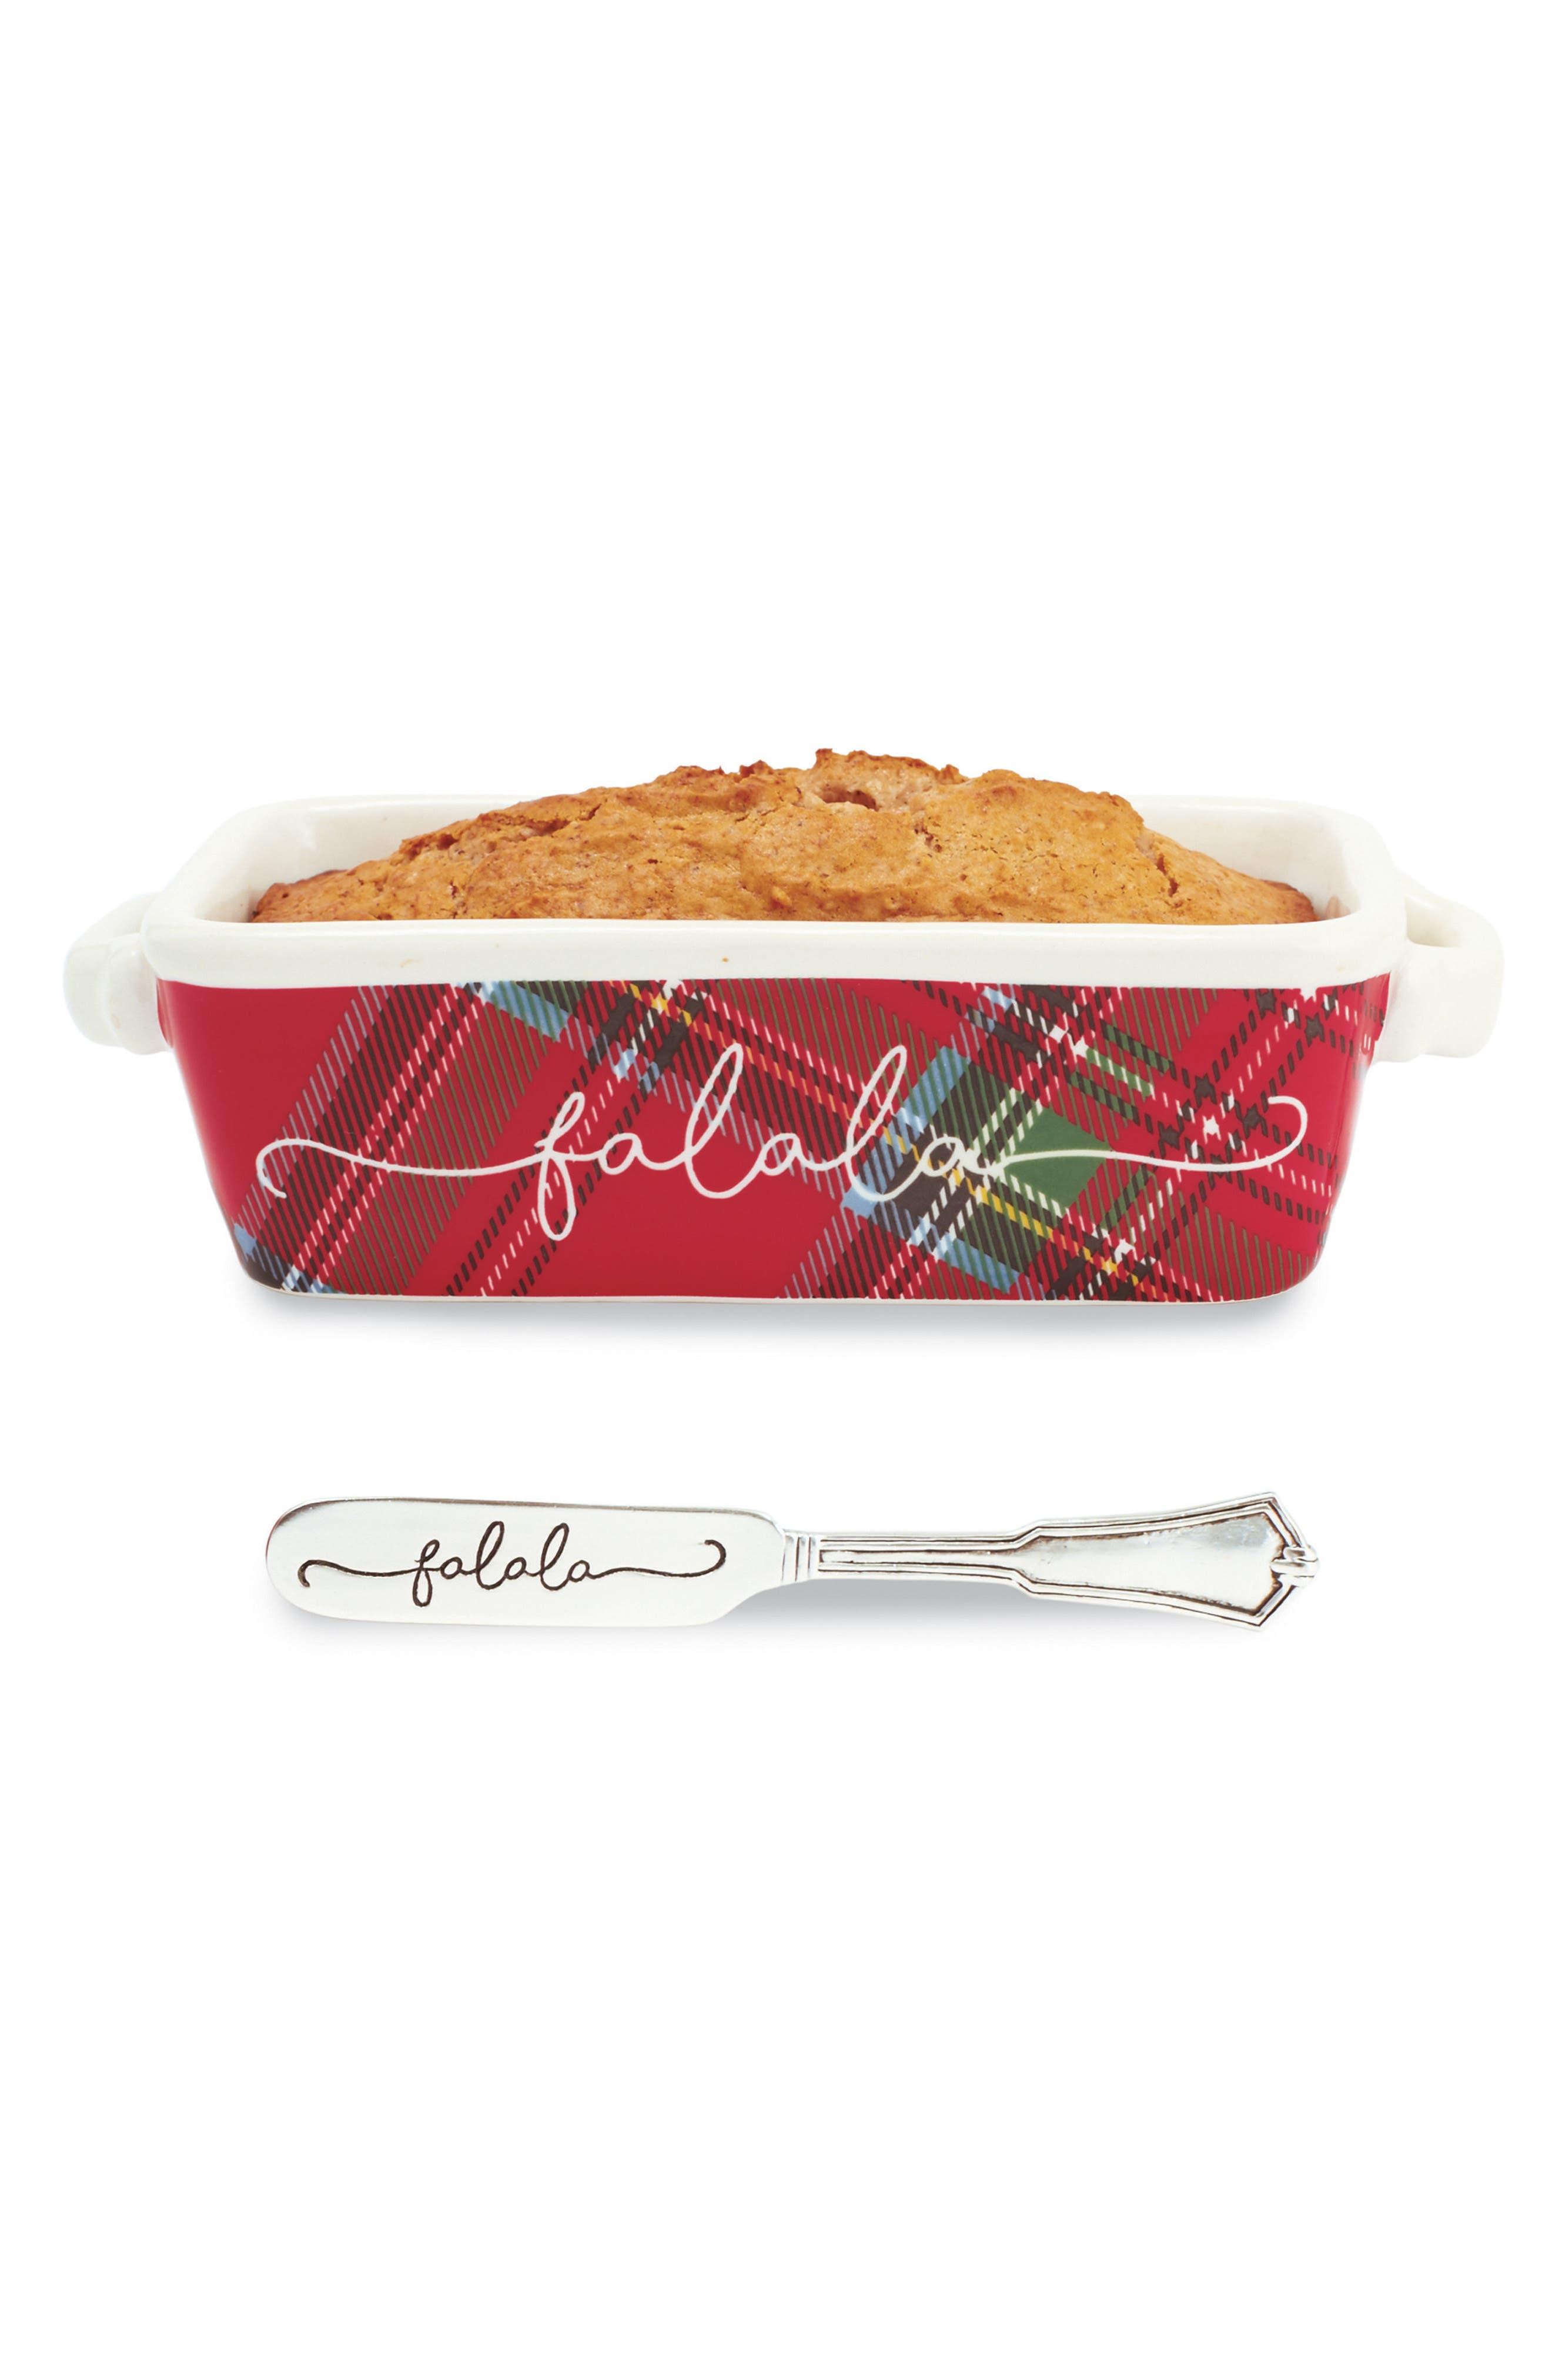 Fa La La Tartan Ceramic Mini Loaf Pan & Spreader,                         Main,                         color, Red